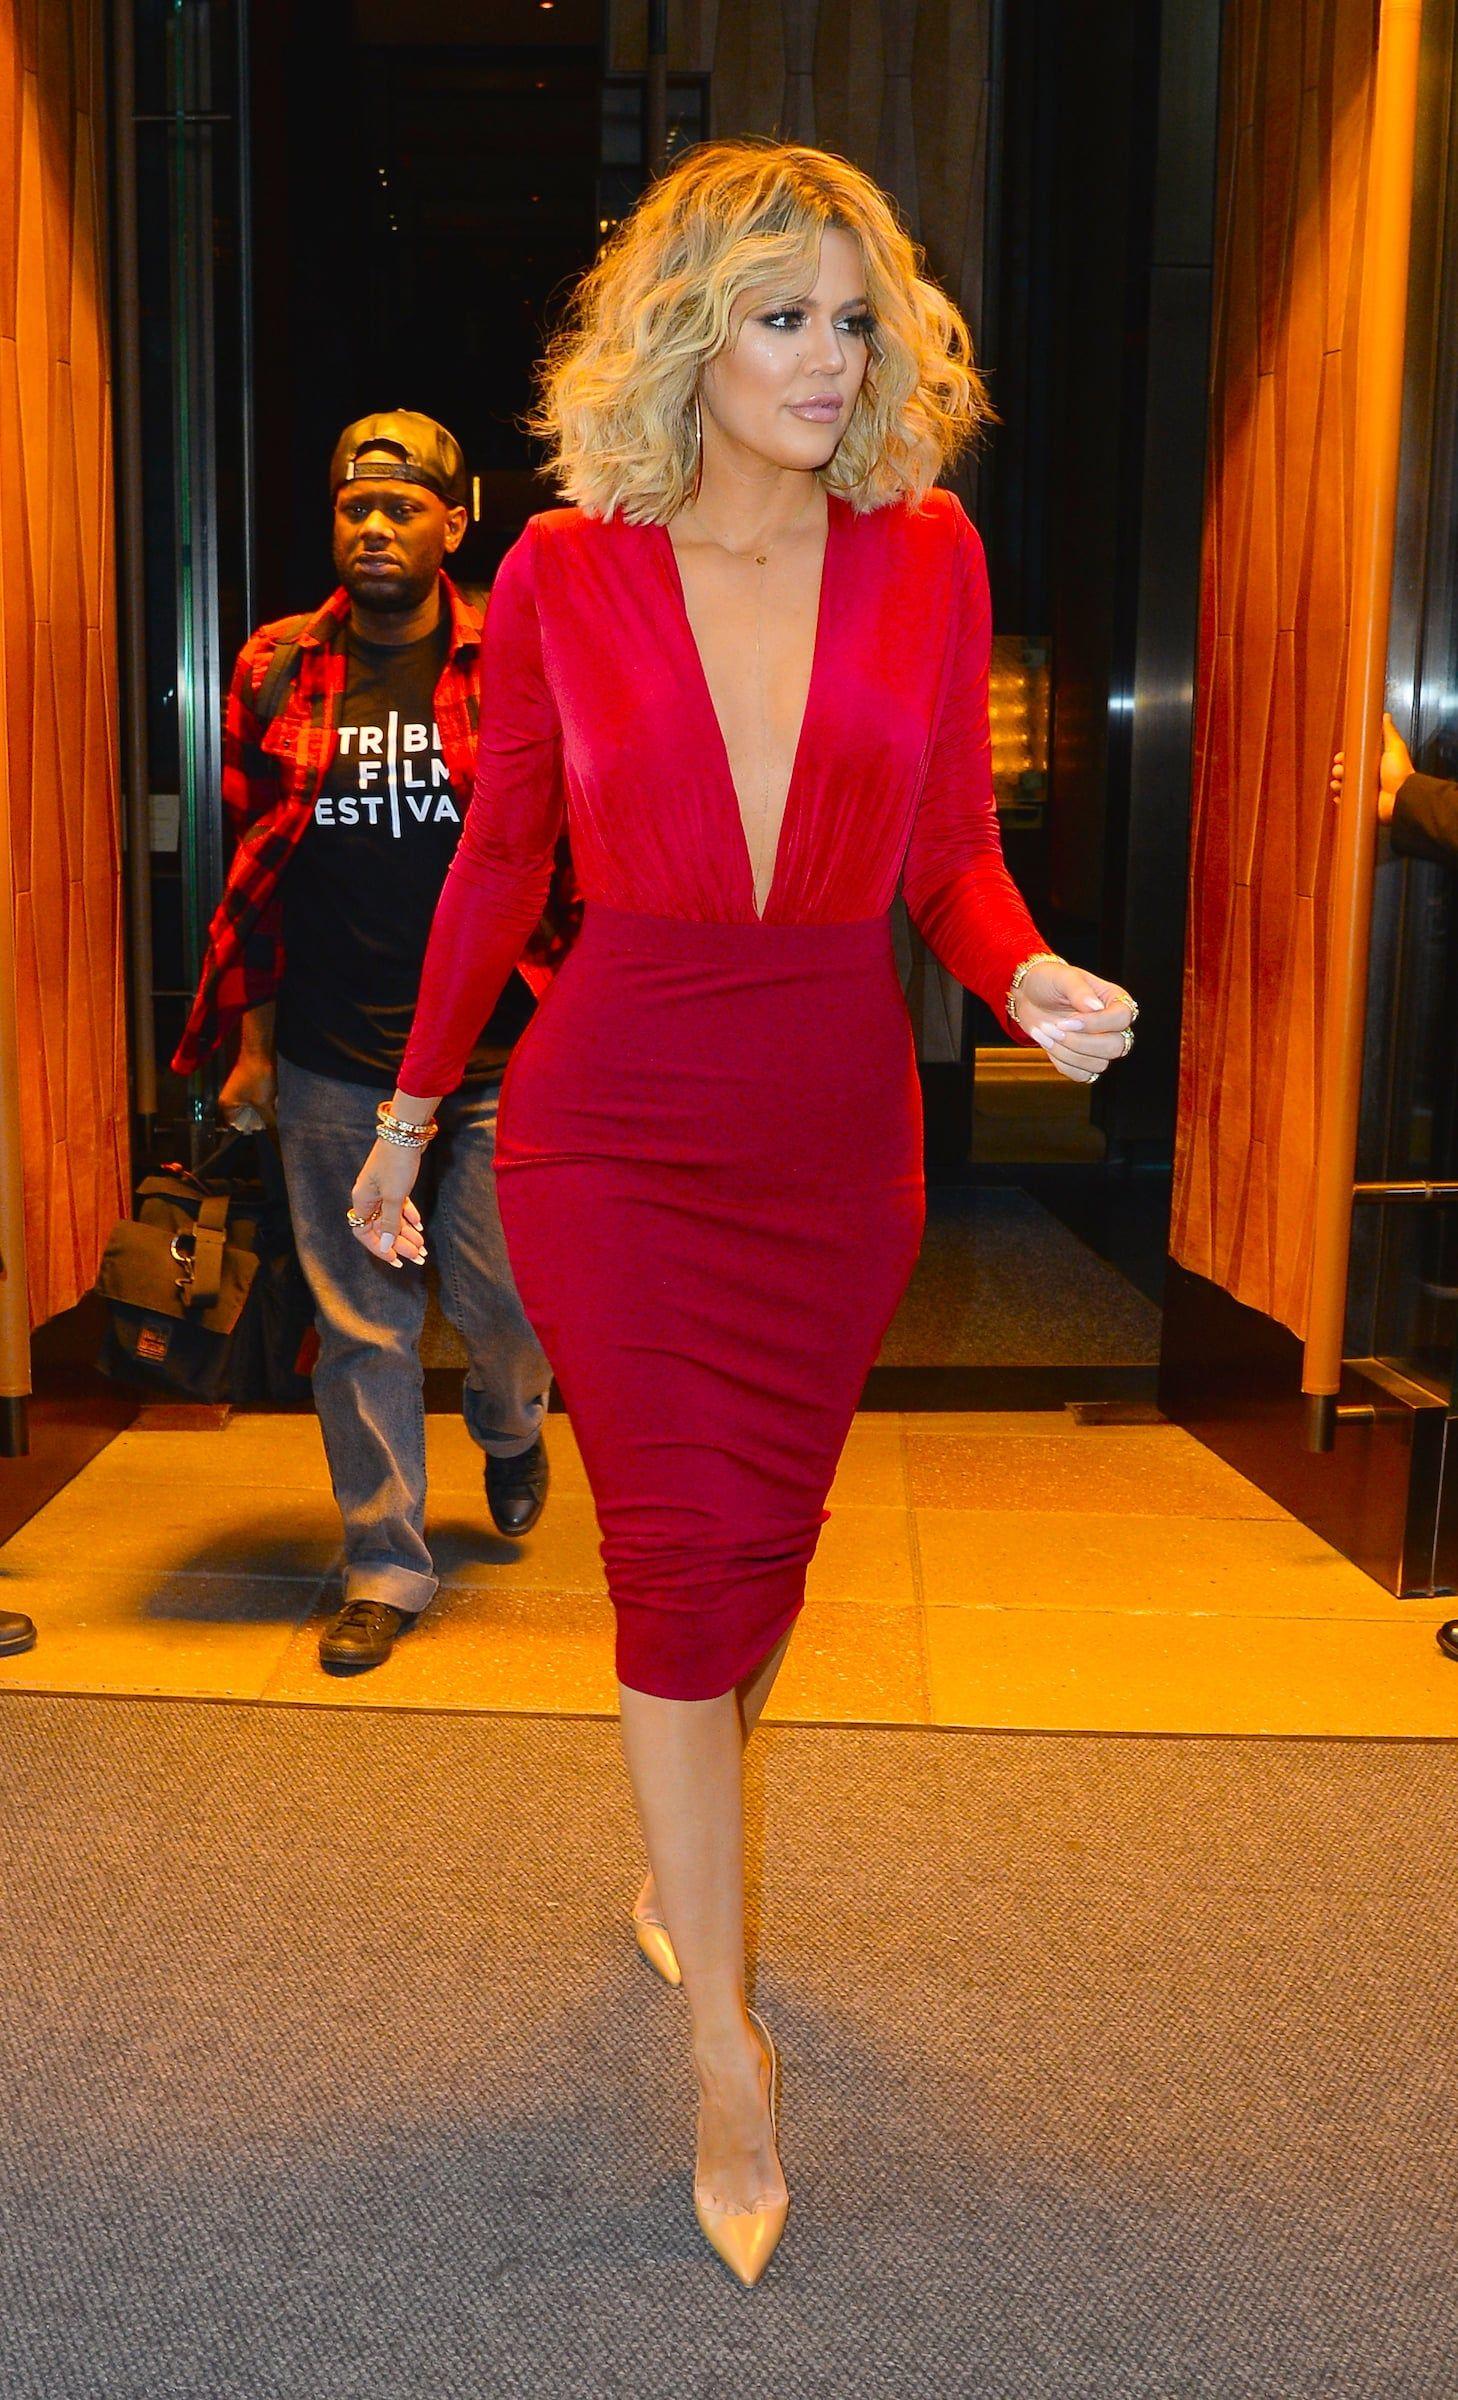 Khloé Kardashian With Medium-Length Curls